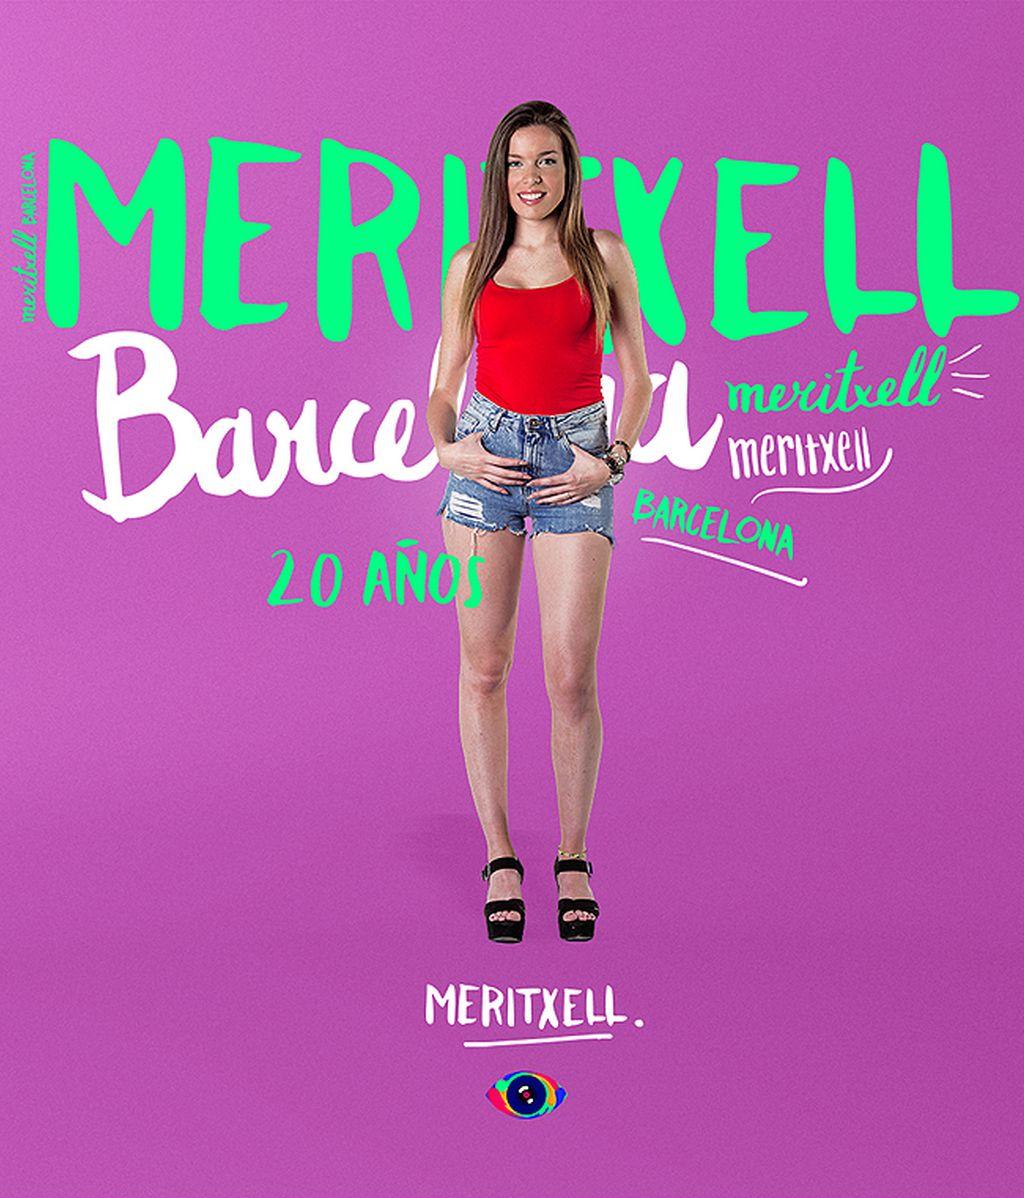 Meritxell, 20 años (Barcelona)